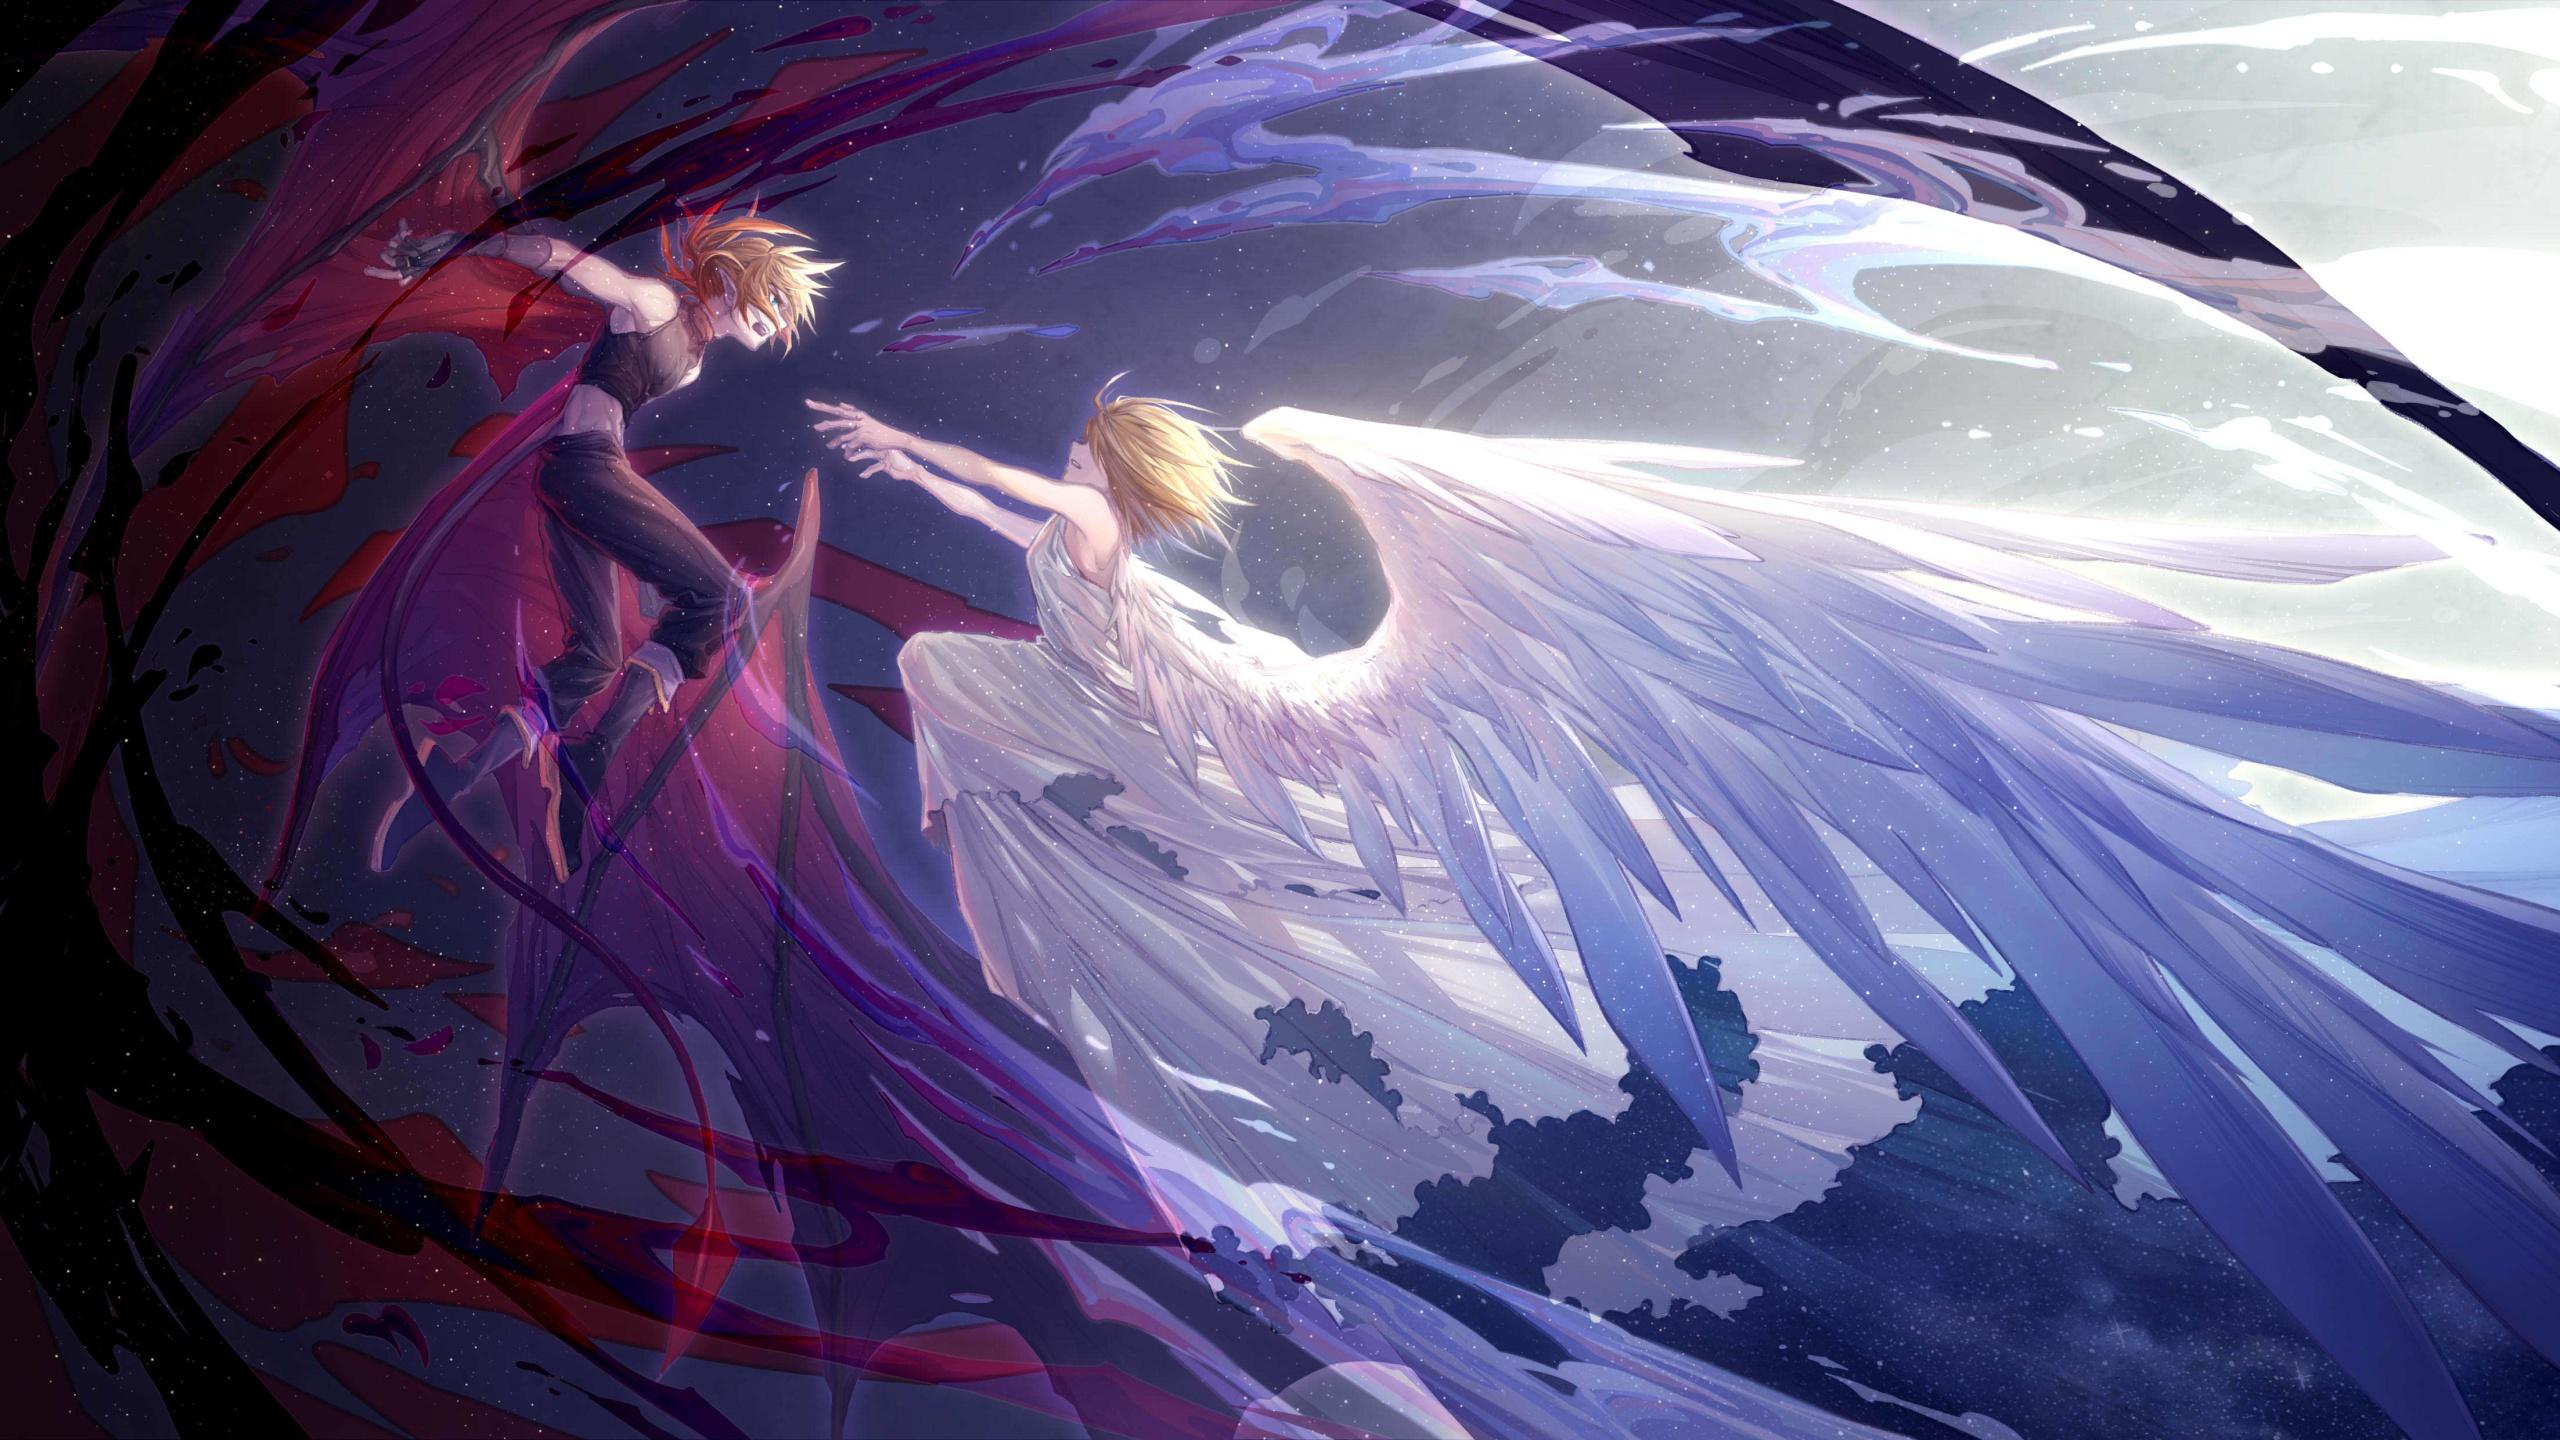 Anime Girls Flying Image